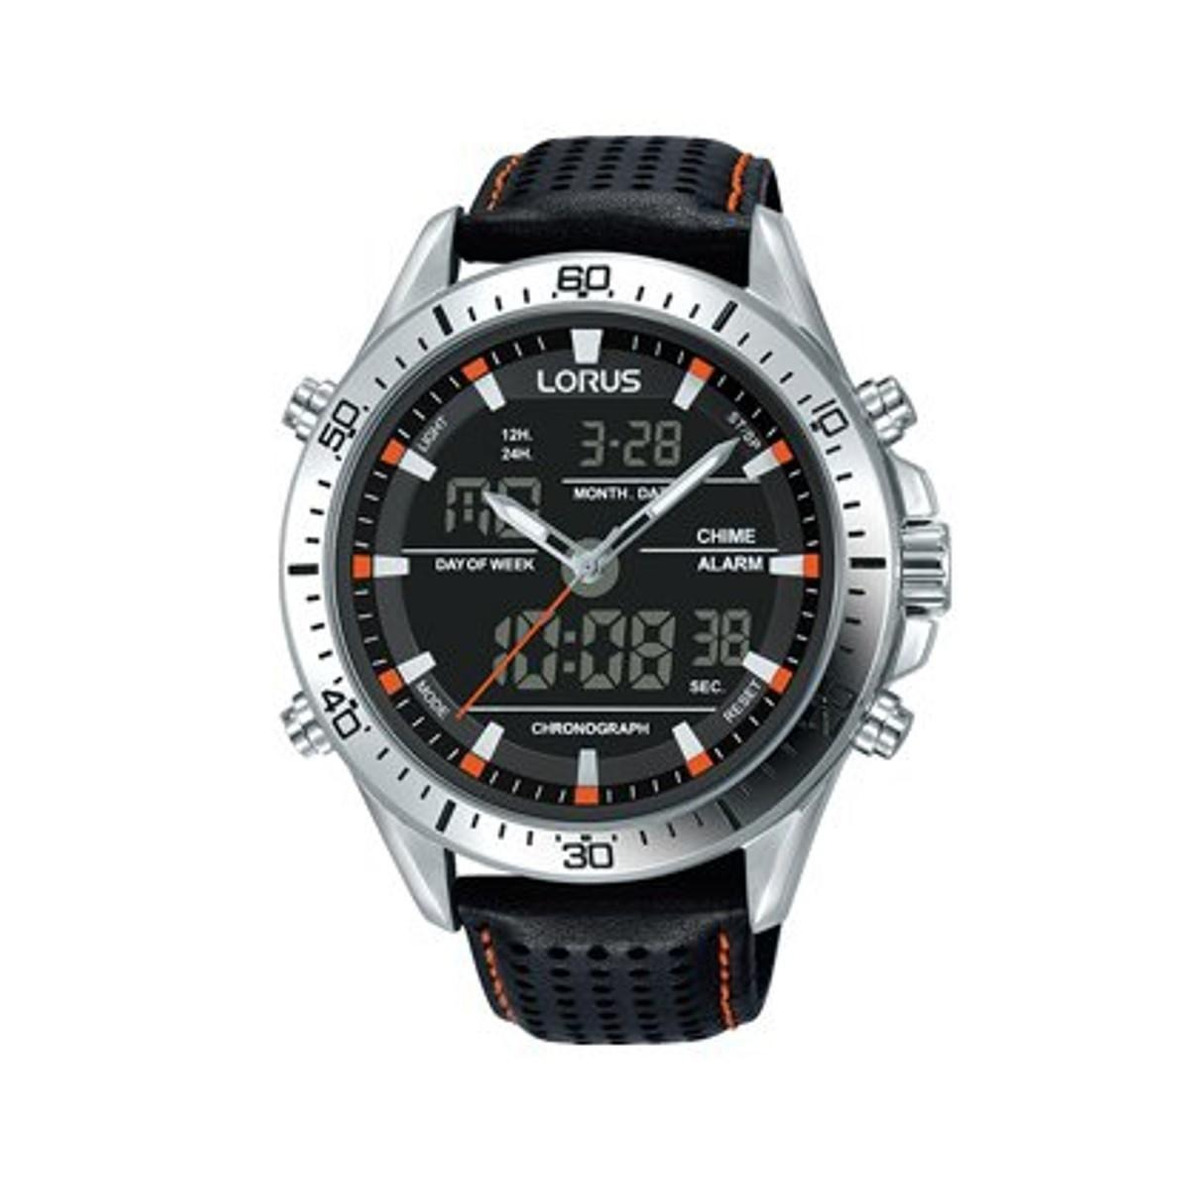 04c5da03076d modelo varon reloj lorus cuarzo caballero rw637ax9. Cargando zoom.